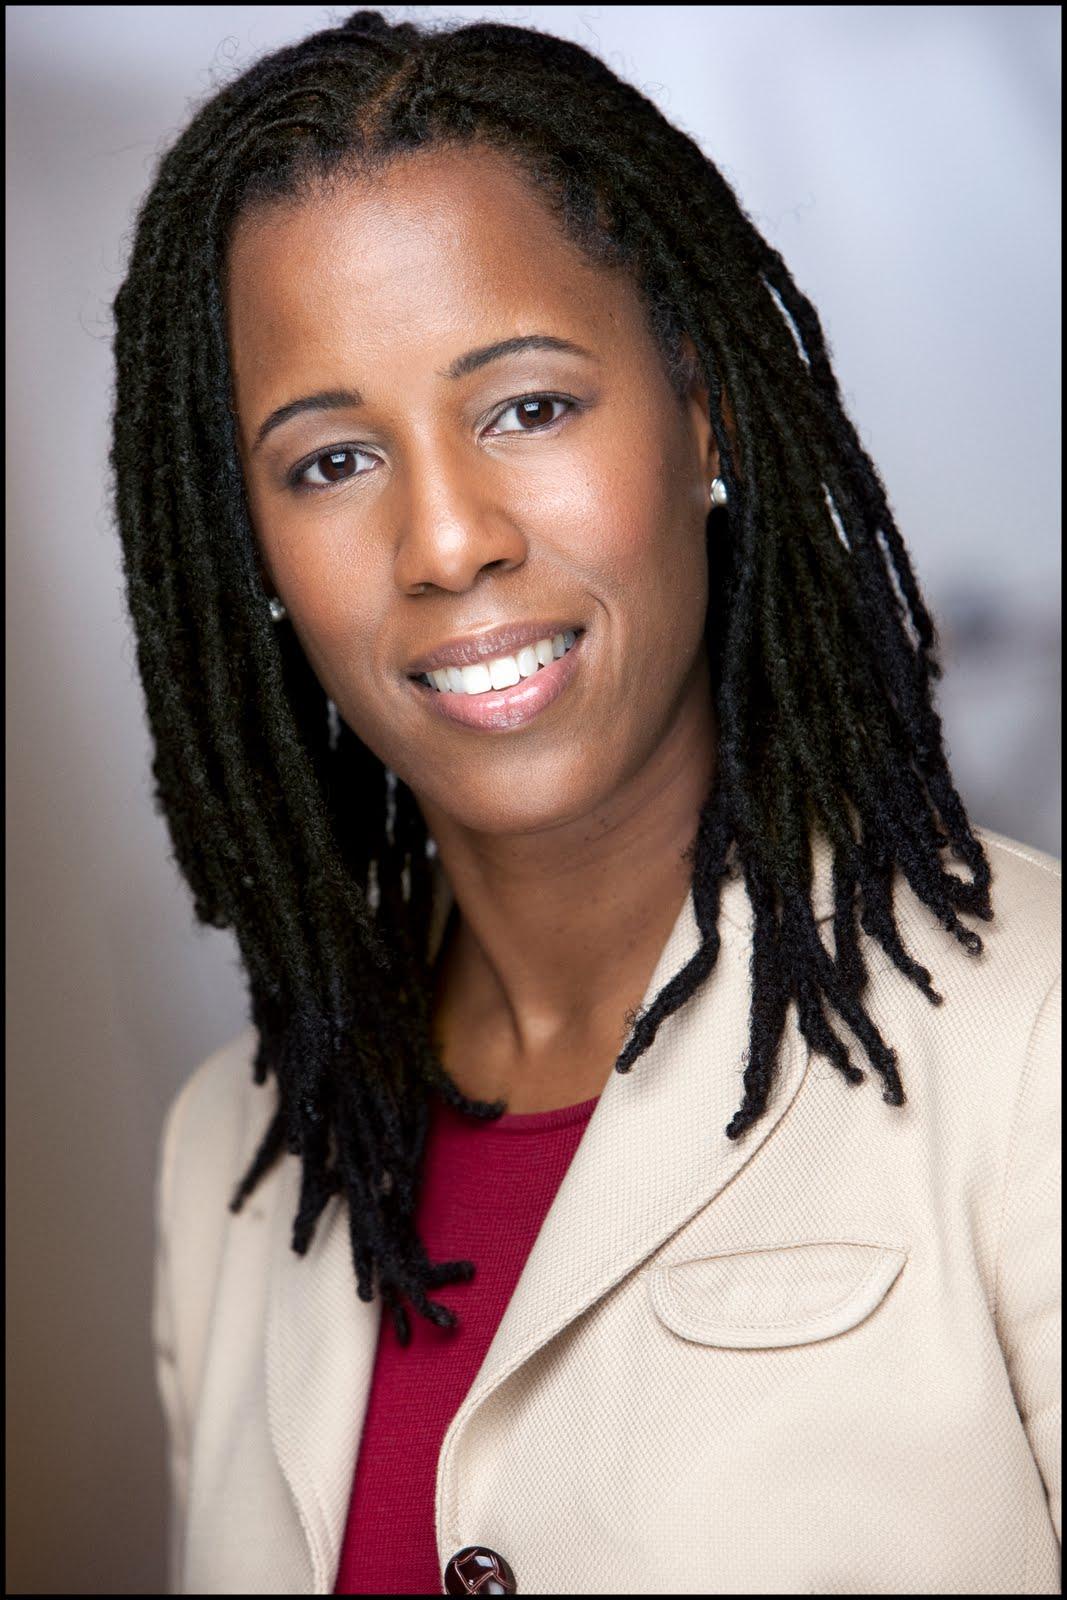 Nicole Lindsay, Founder, DiversityMBAPrep.com